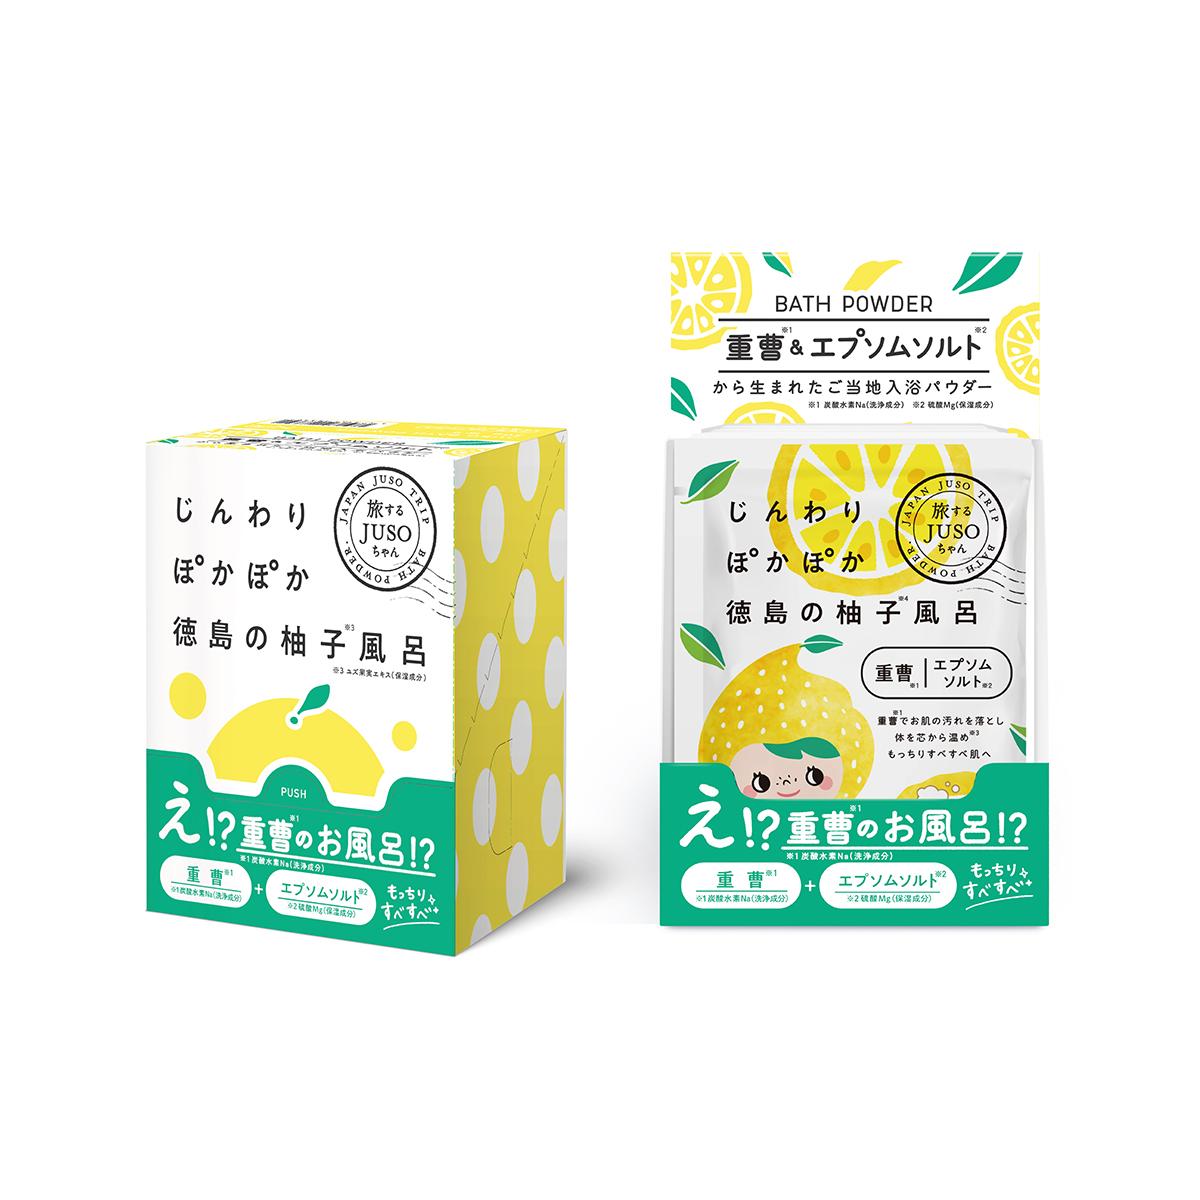 JUSO BATH POWDER 柚子 10包入り(重曹バスパウダー ゆず)